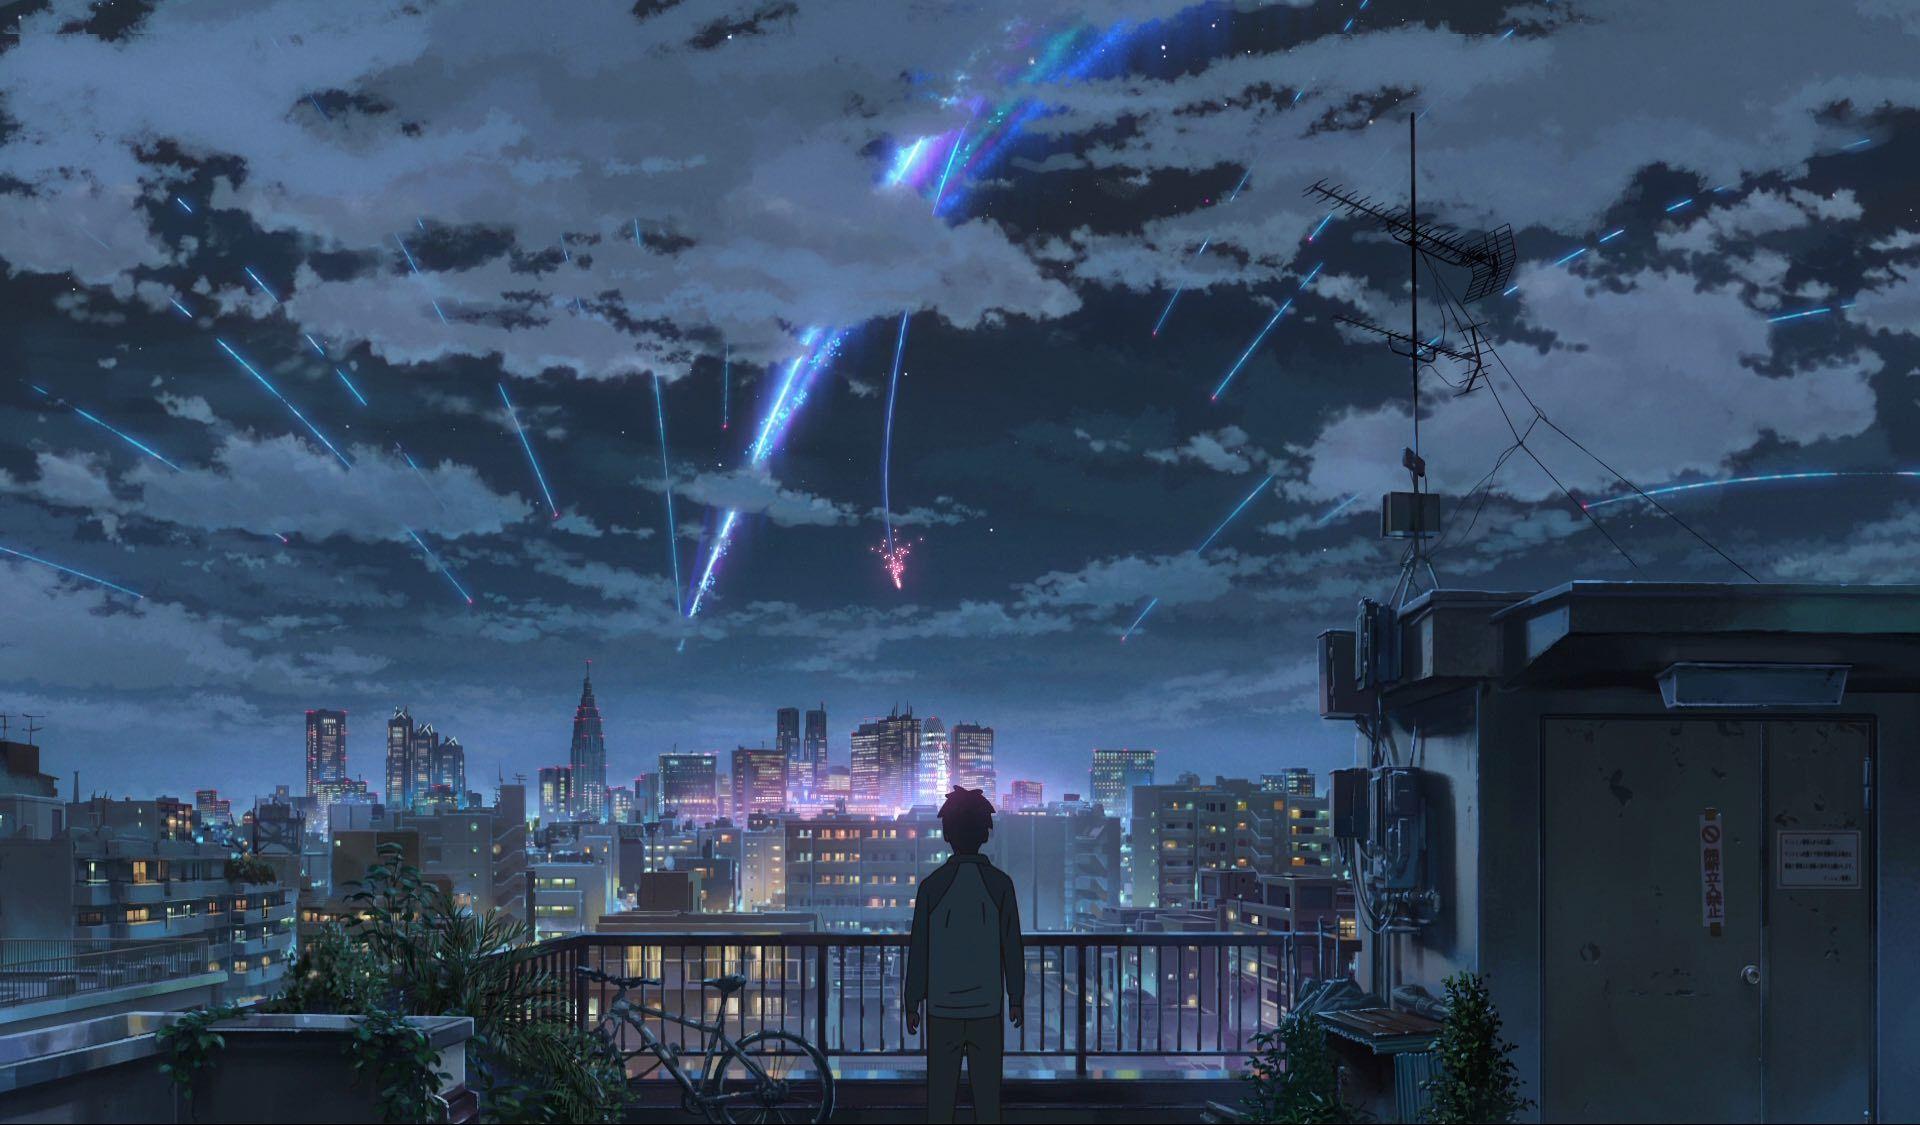 Your Name 100 Original Background Collection Kimi No Na Wa Wallpaper Kimi No Na Wa Your Name Anime